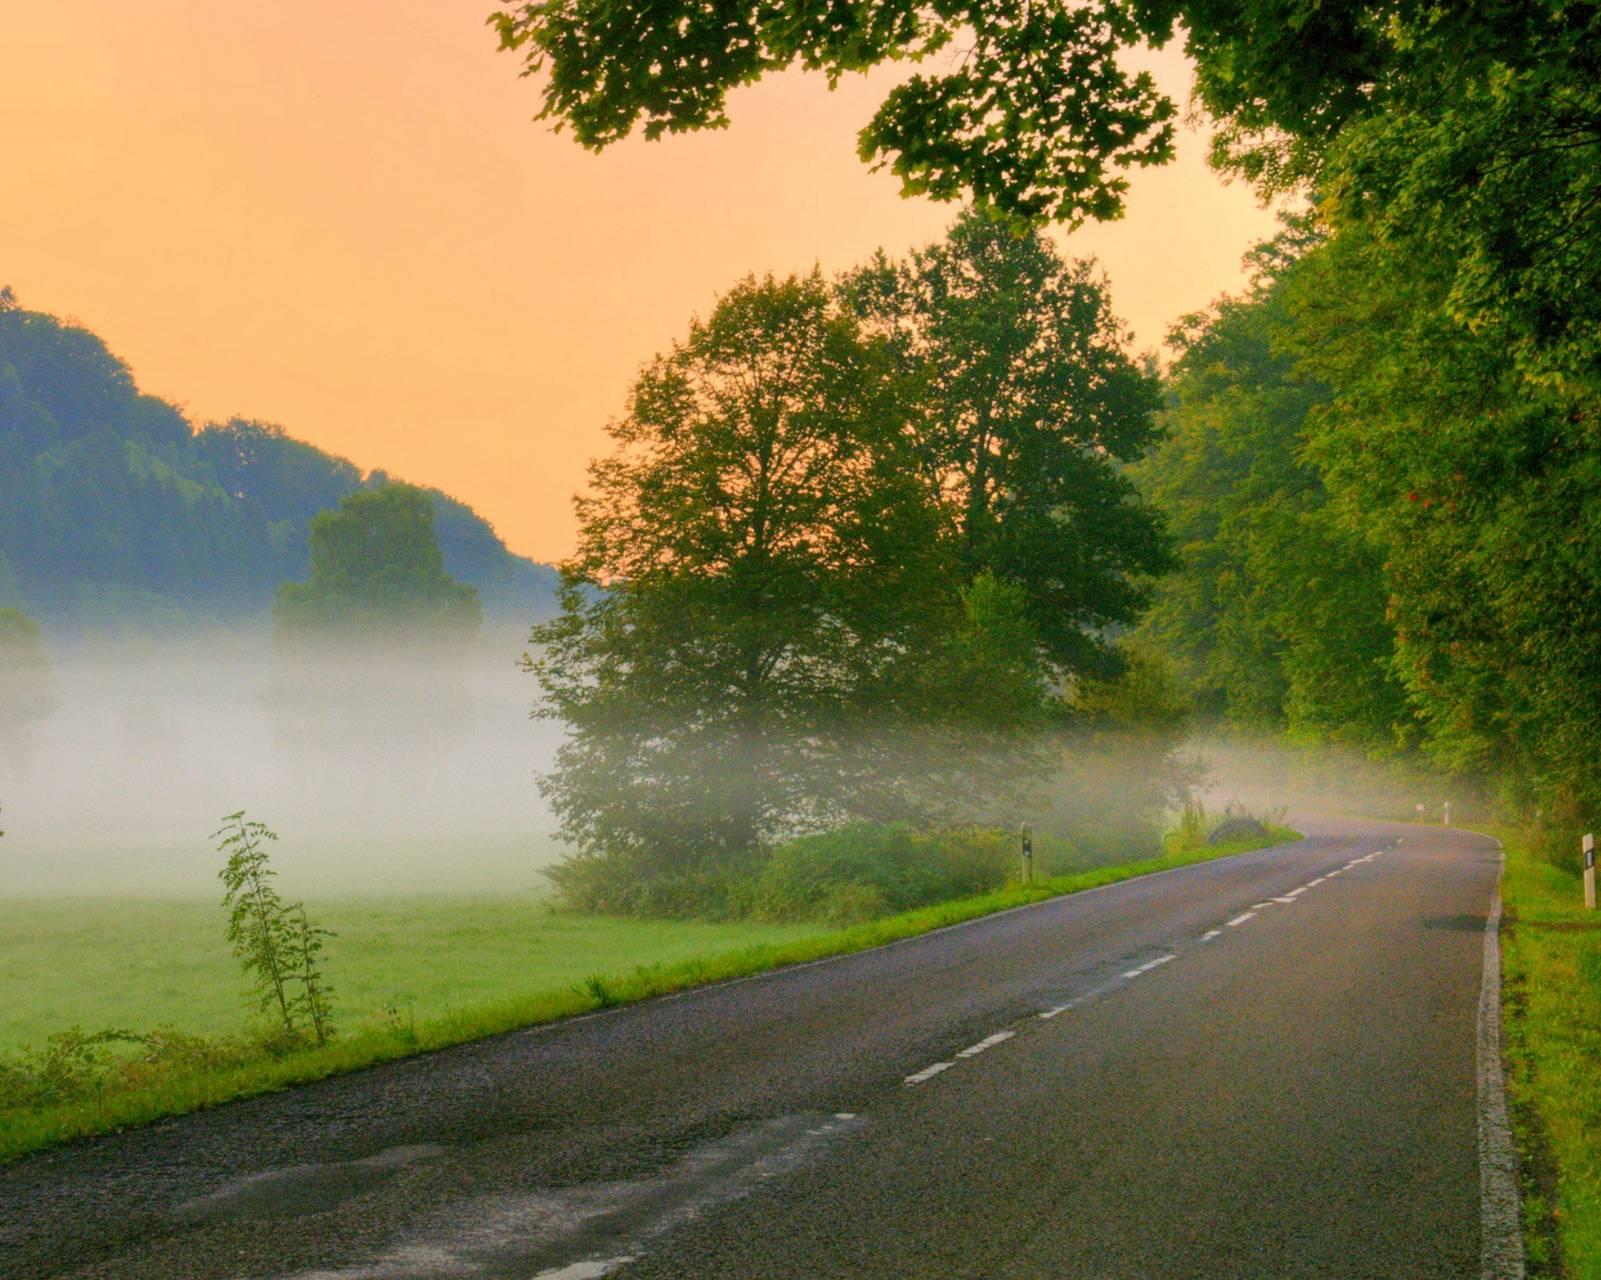 Mist Roads